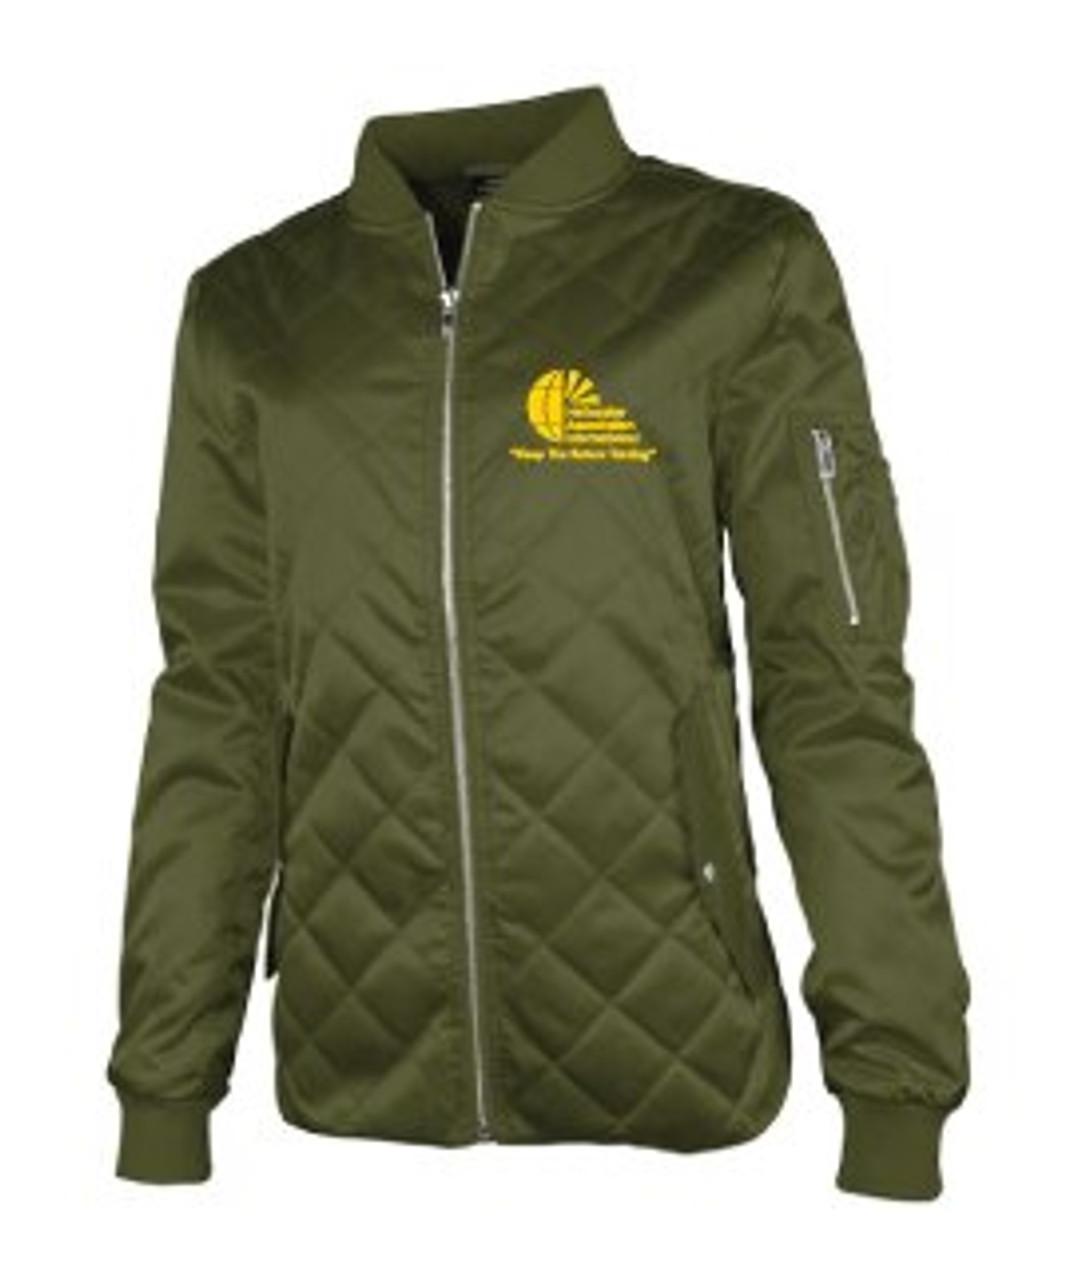 Ladies Green Quilted Flight Jacket